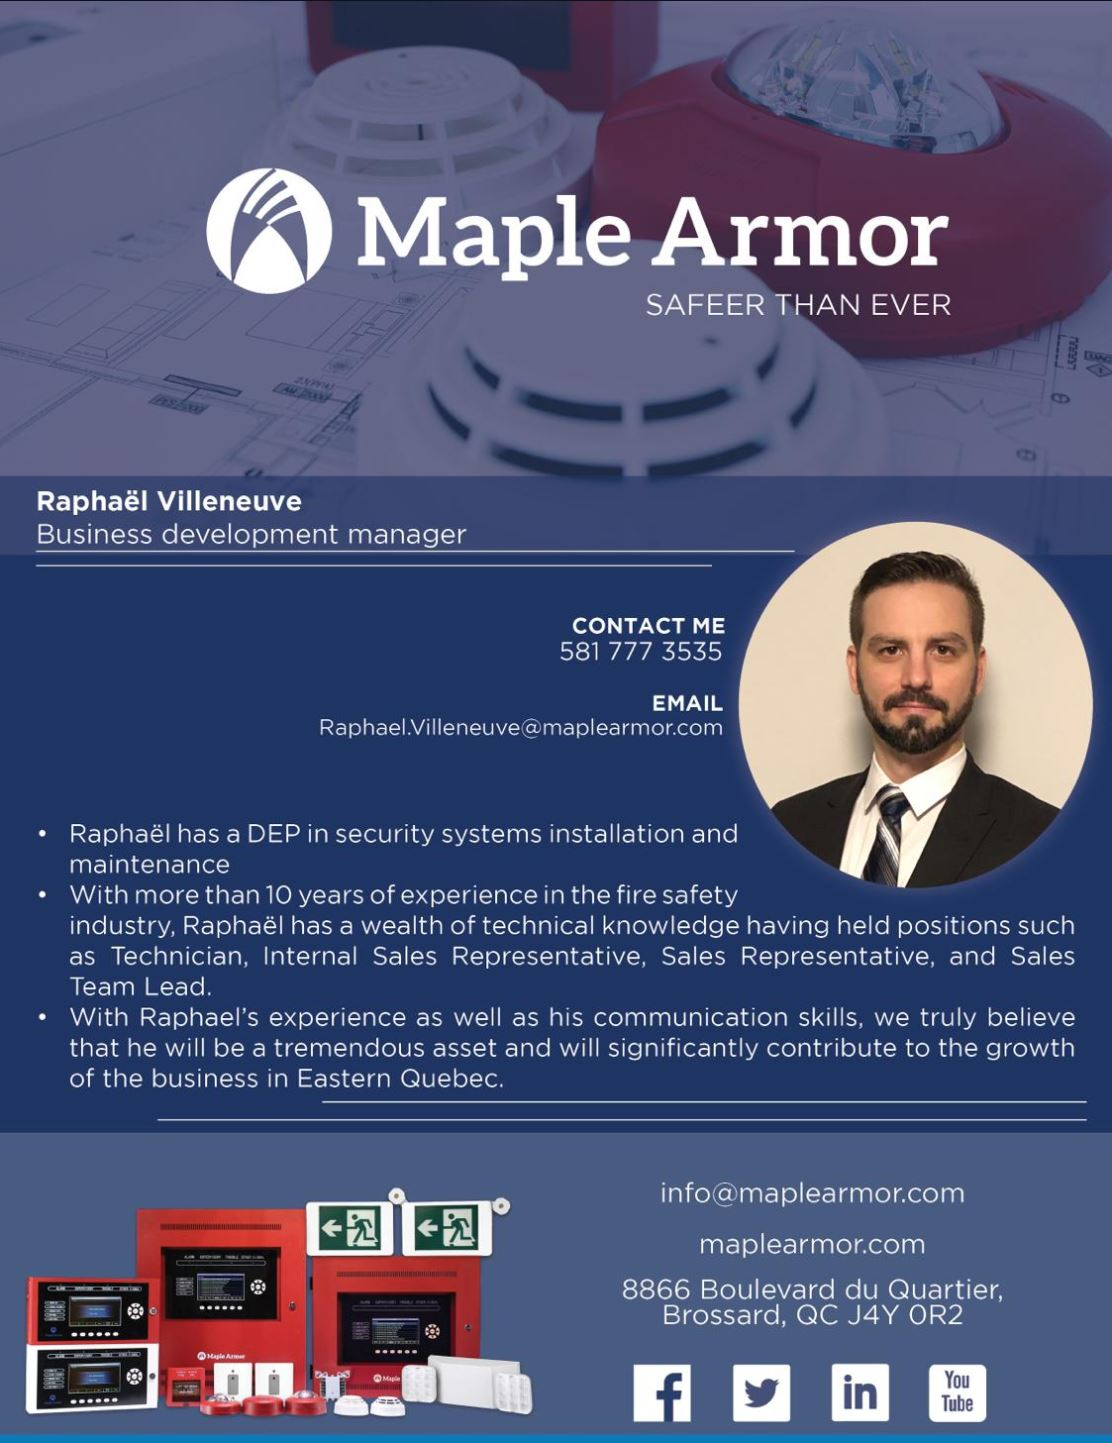 Maple Armor business development manager